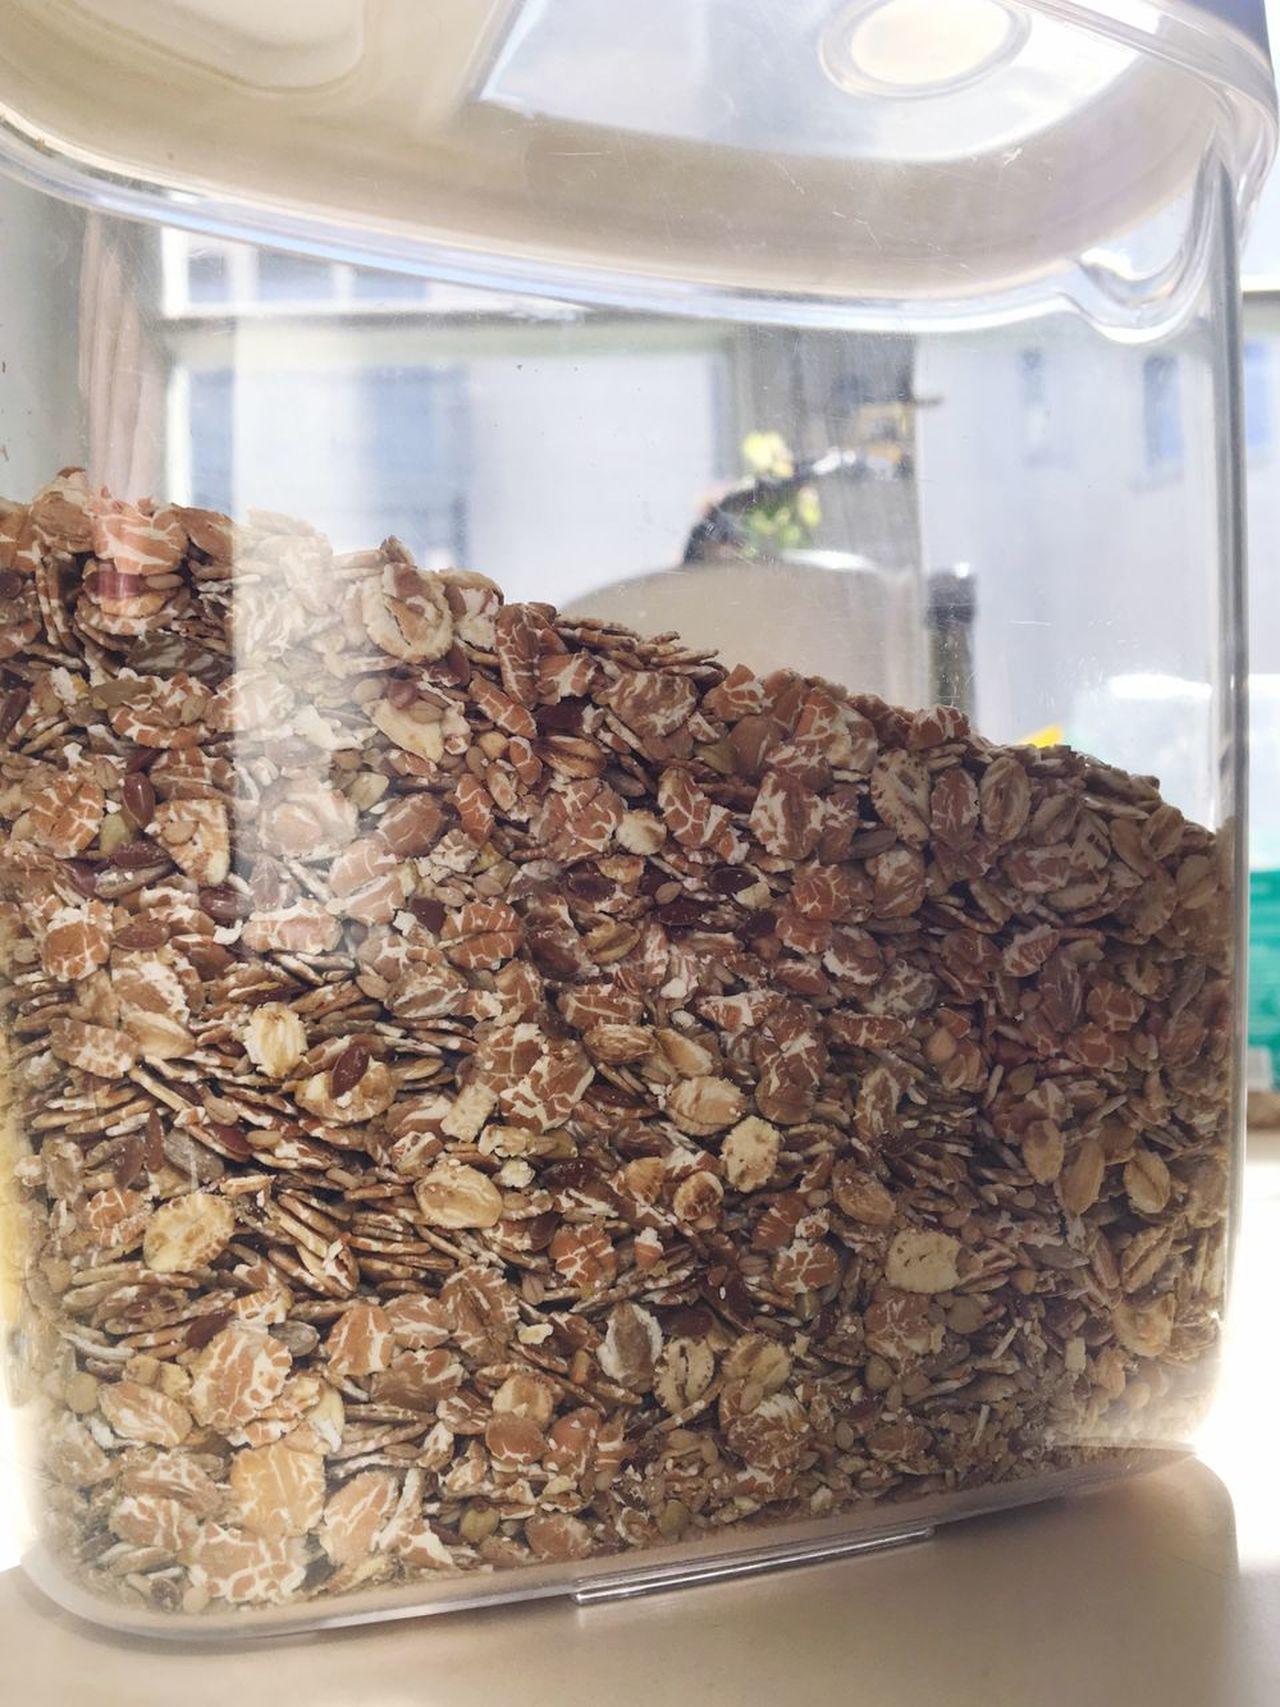 Müsli Breakfast Mixed Grains Cereals Wholegrain Avena Oats Havervlokken Rogge Healthy Breakfast Close-up Colazione Frühstück Gesund Benessere Wellbeing Organic Food